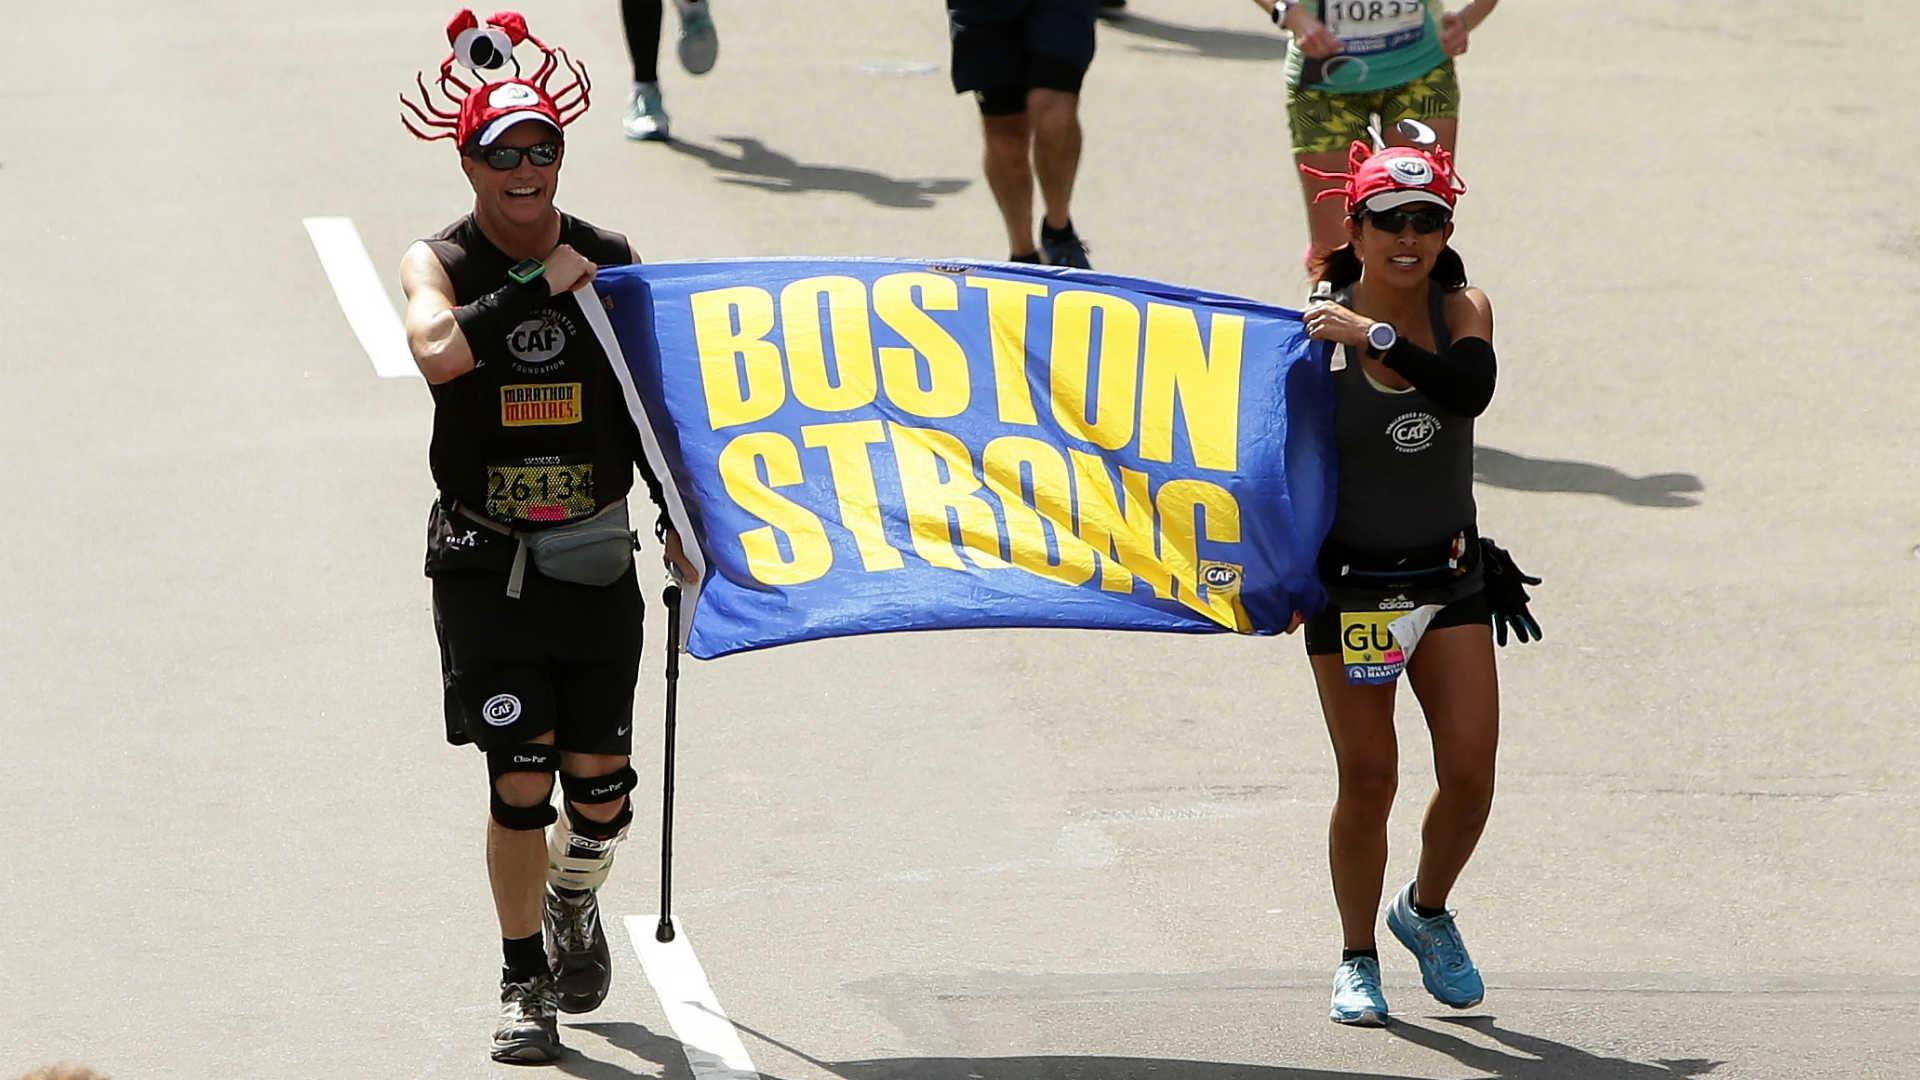 Boston Marathon's race director to run 30th 'solothon'